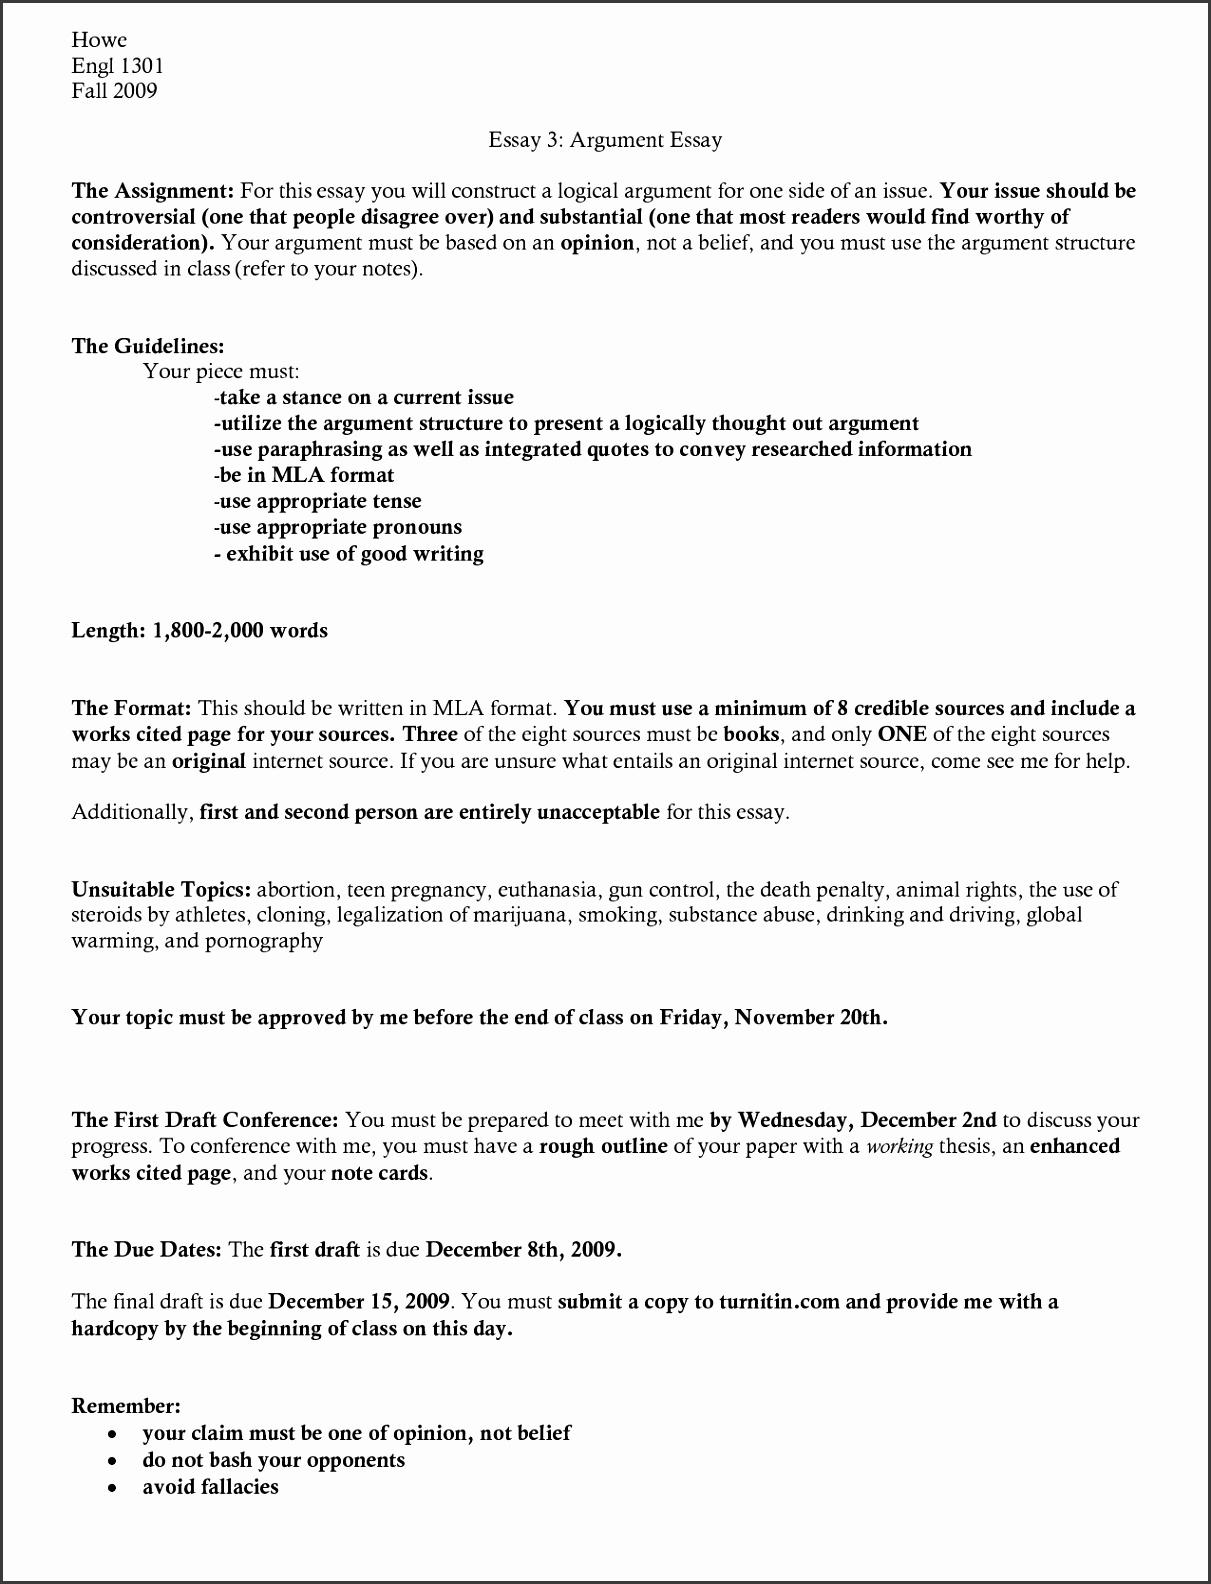 research persuasive essay persuasive essay mla format mla style essays oglasi essay using essay research persuasive essay topics possible college essay